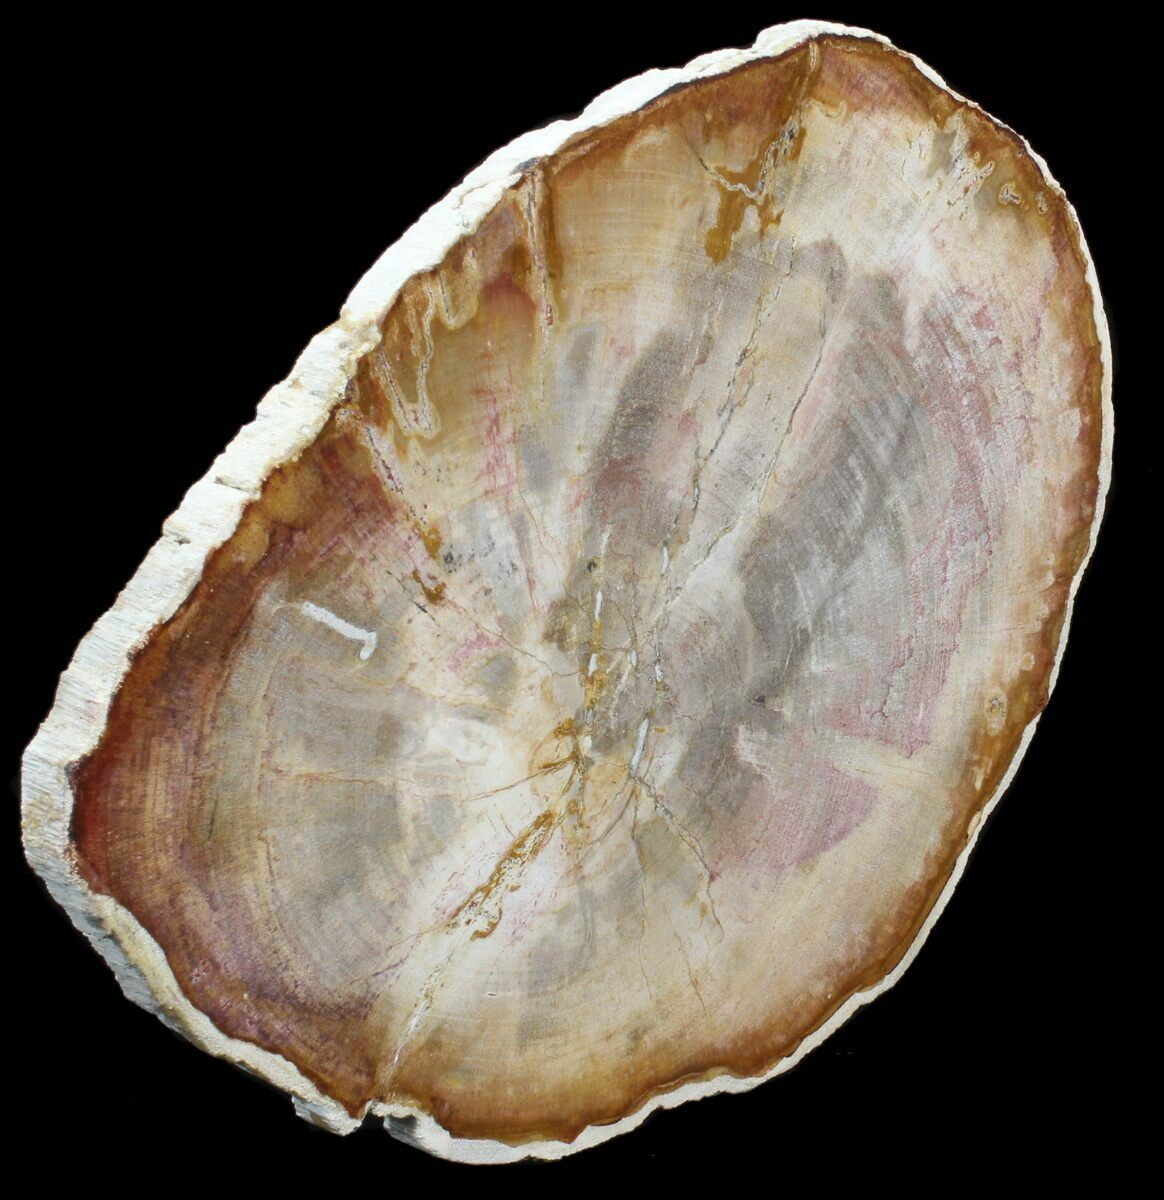 10.6 Petrified Wood (Tropical Hardwood) Slab - Indonesia